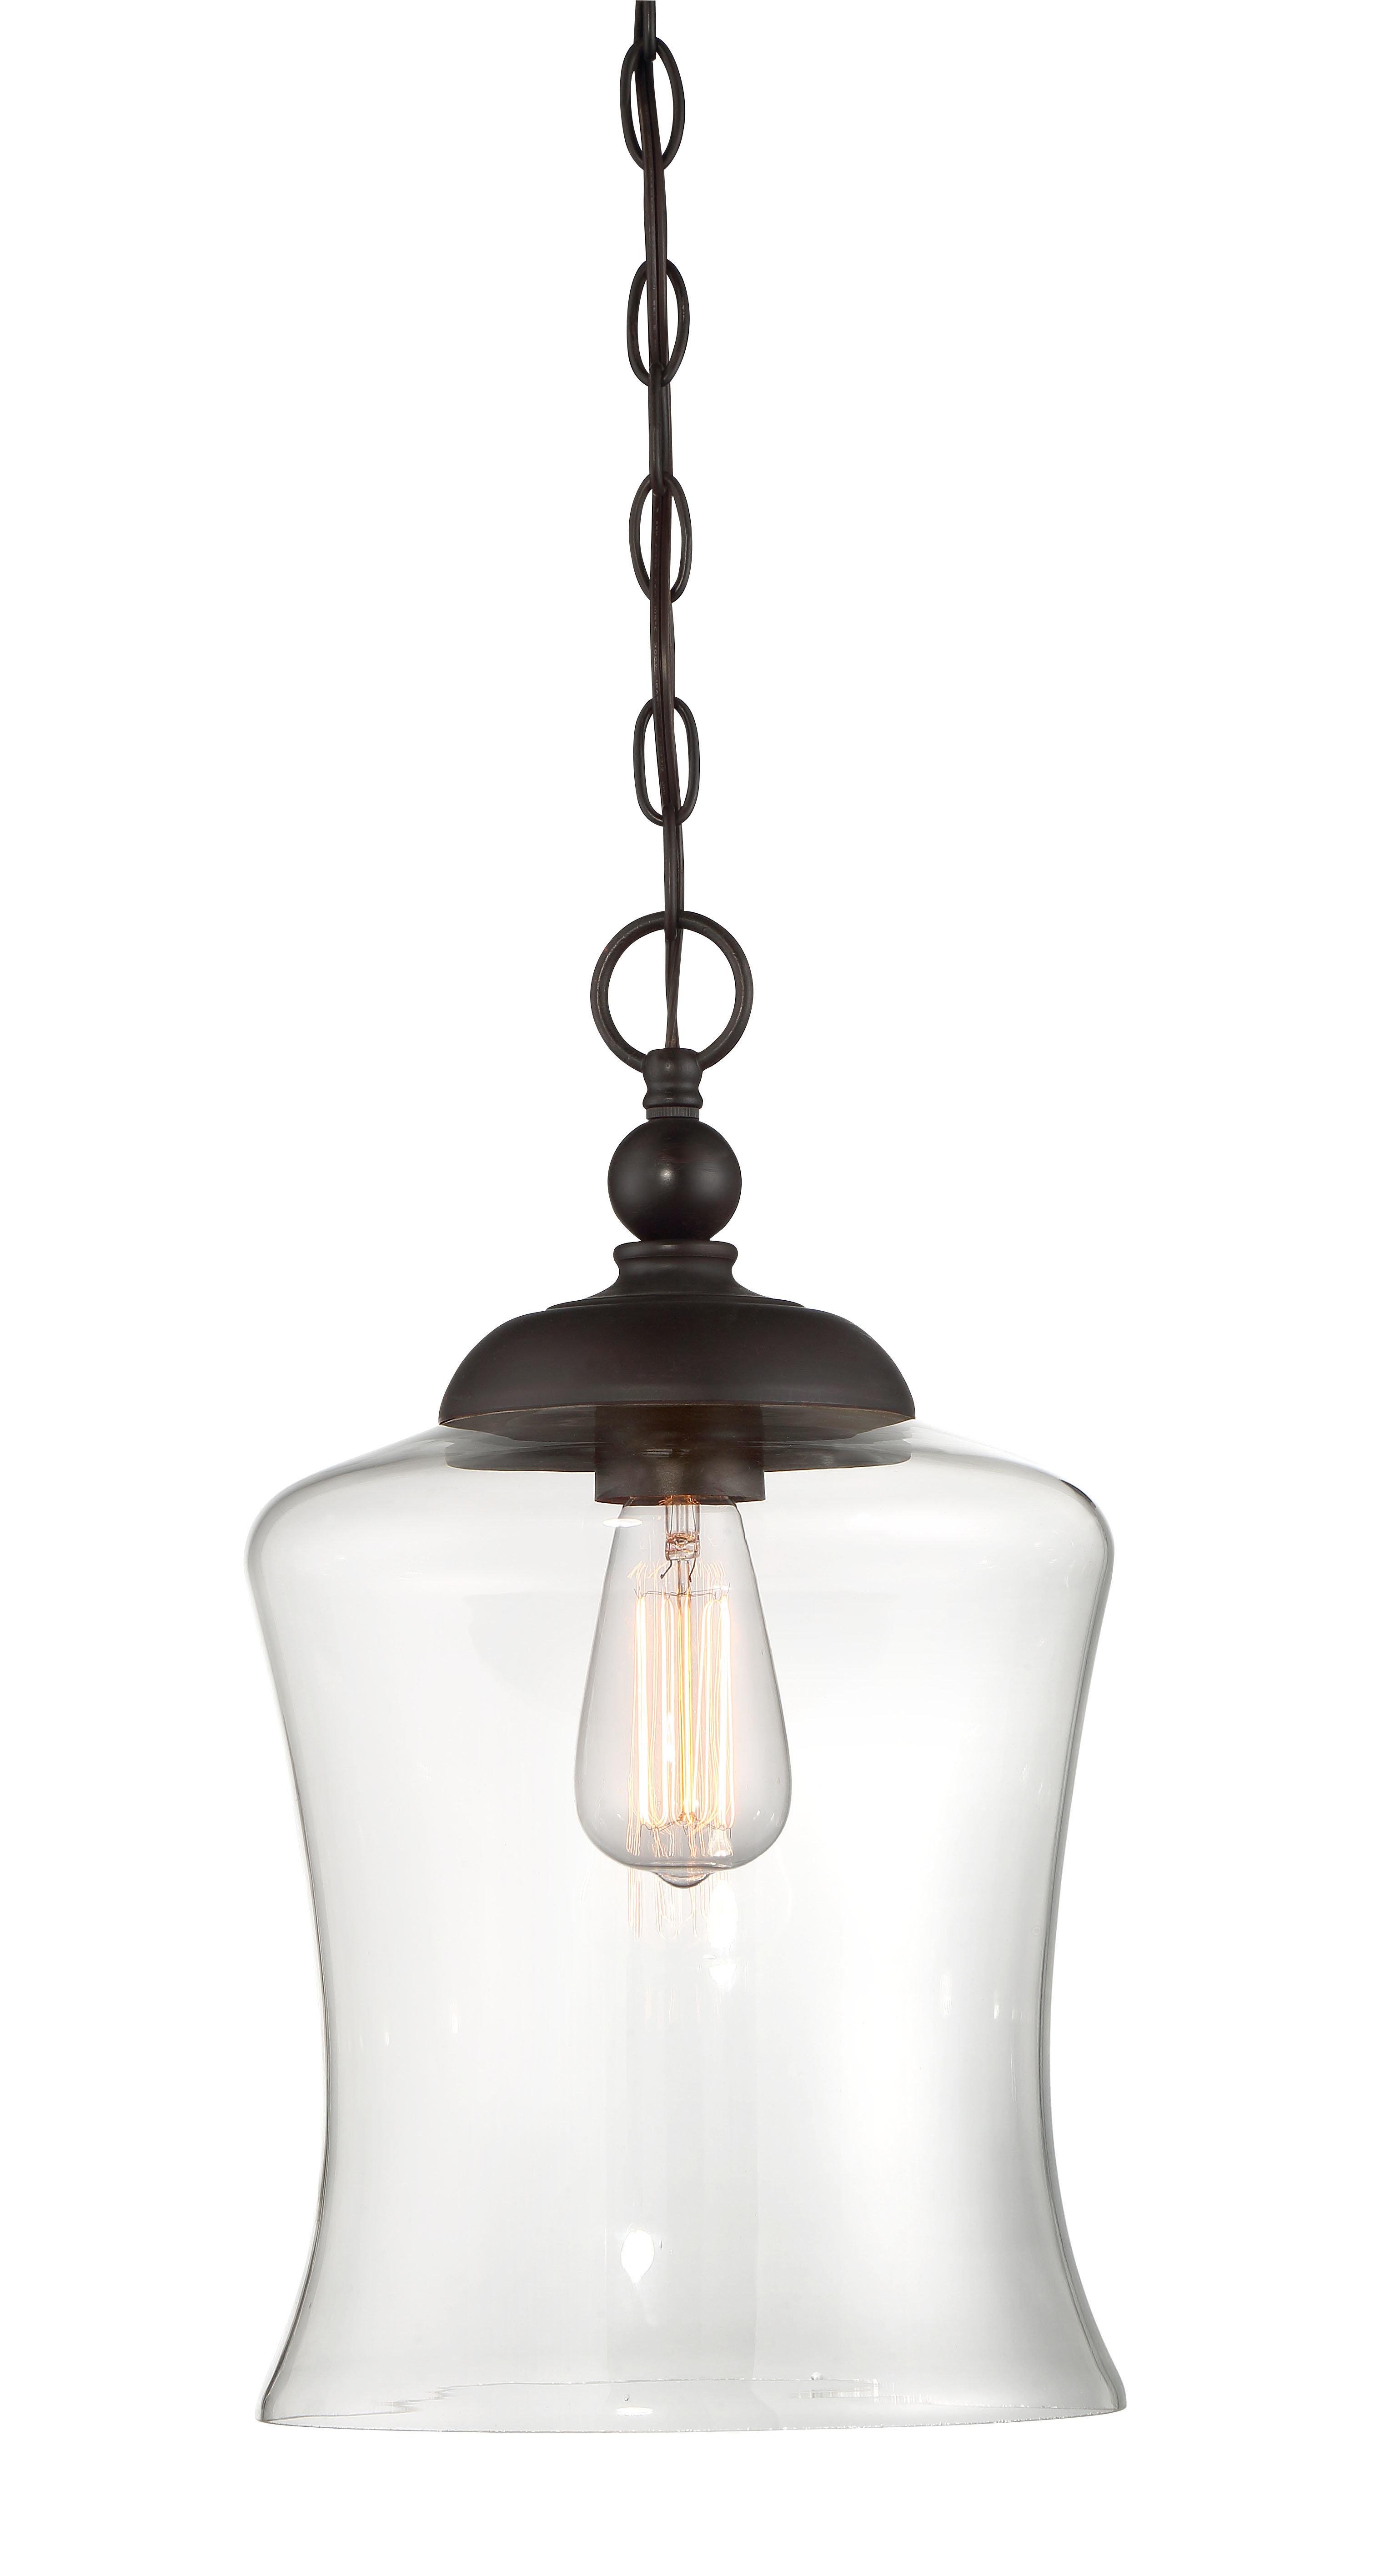 Wentzville 1 Light Single Bell Pendant With Carey 1 Light Single Bell Pendants (View 29 of 30)